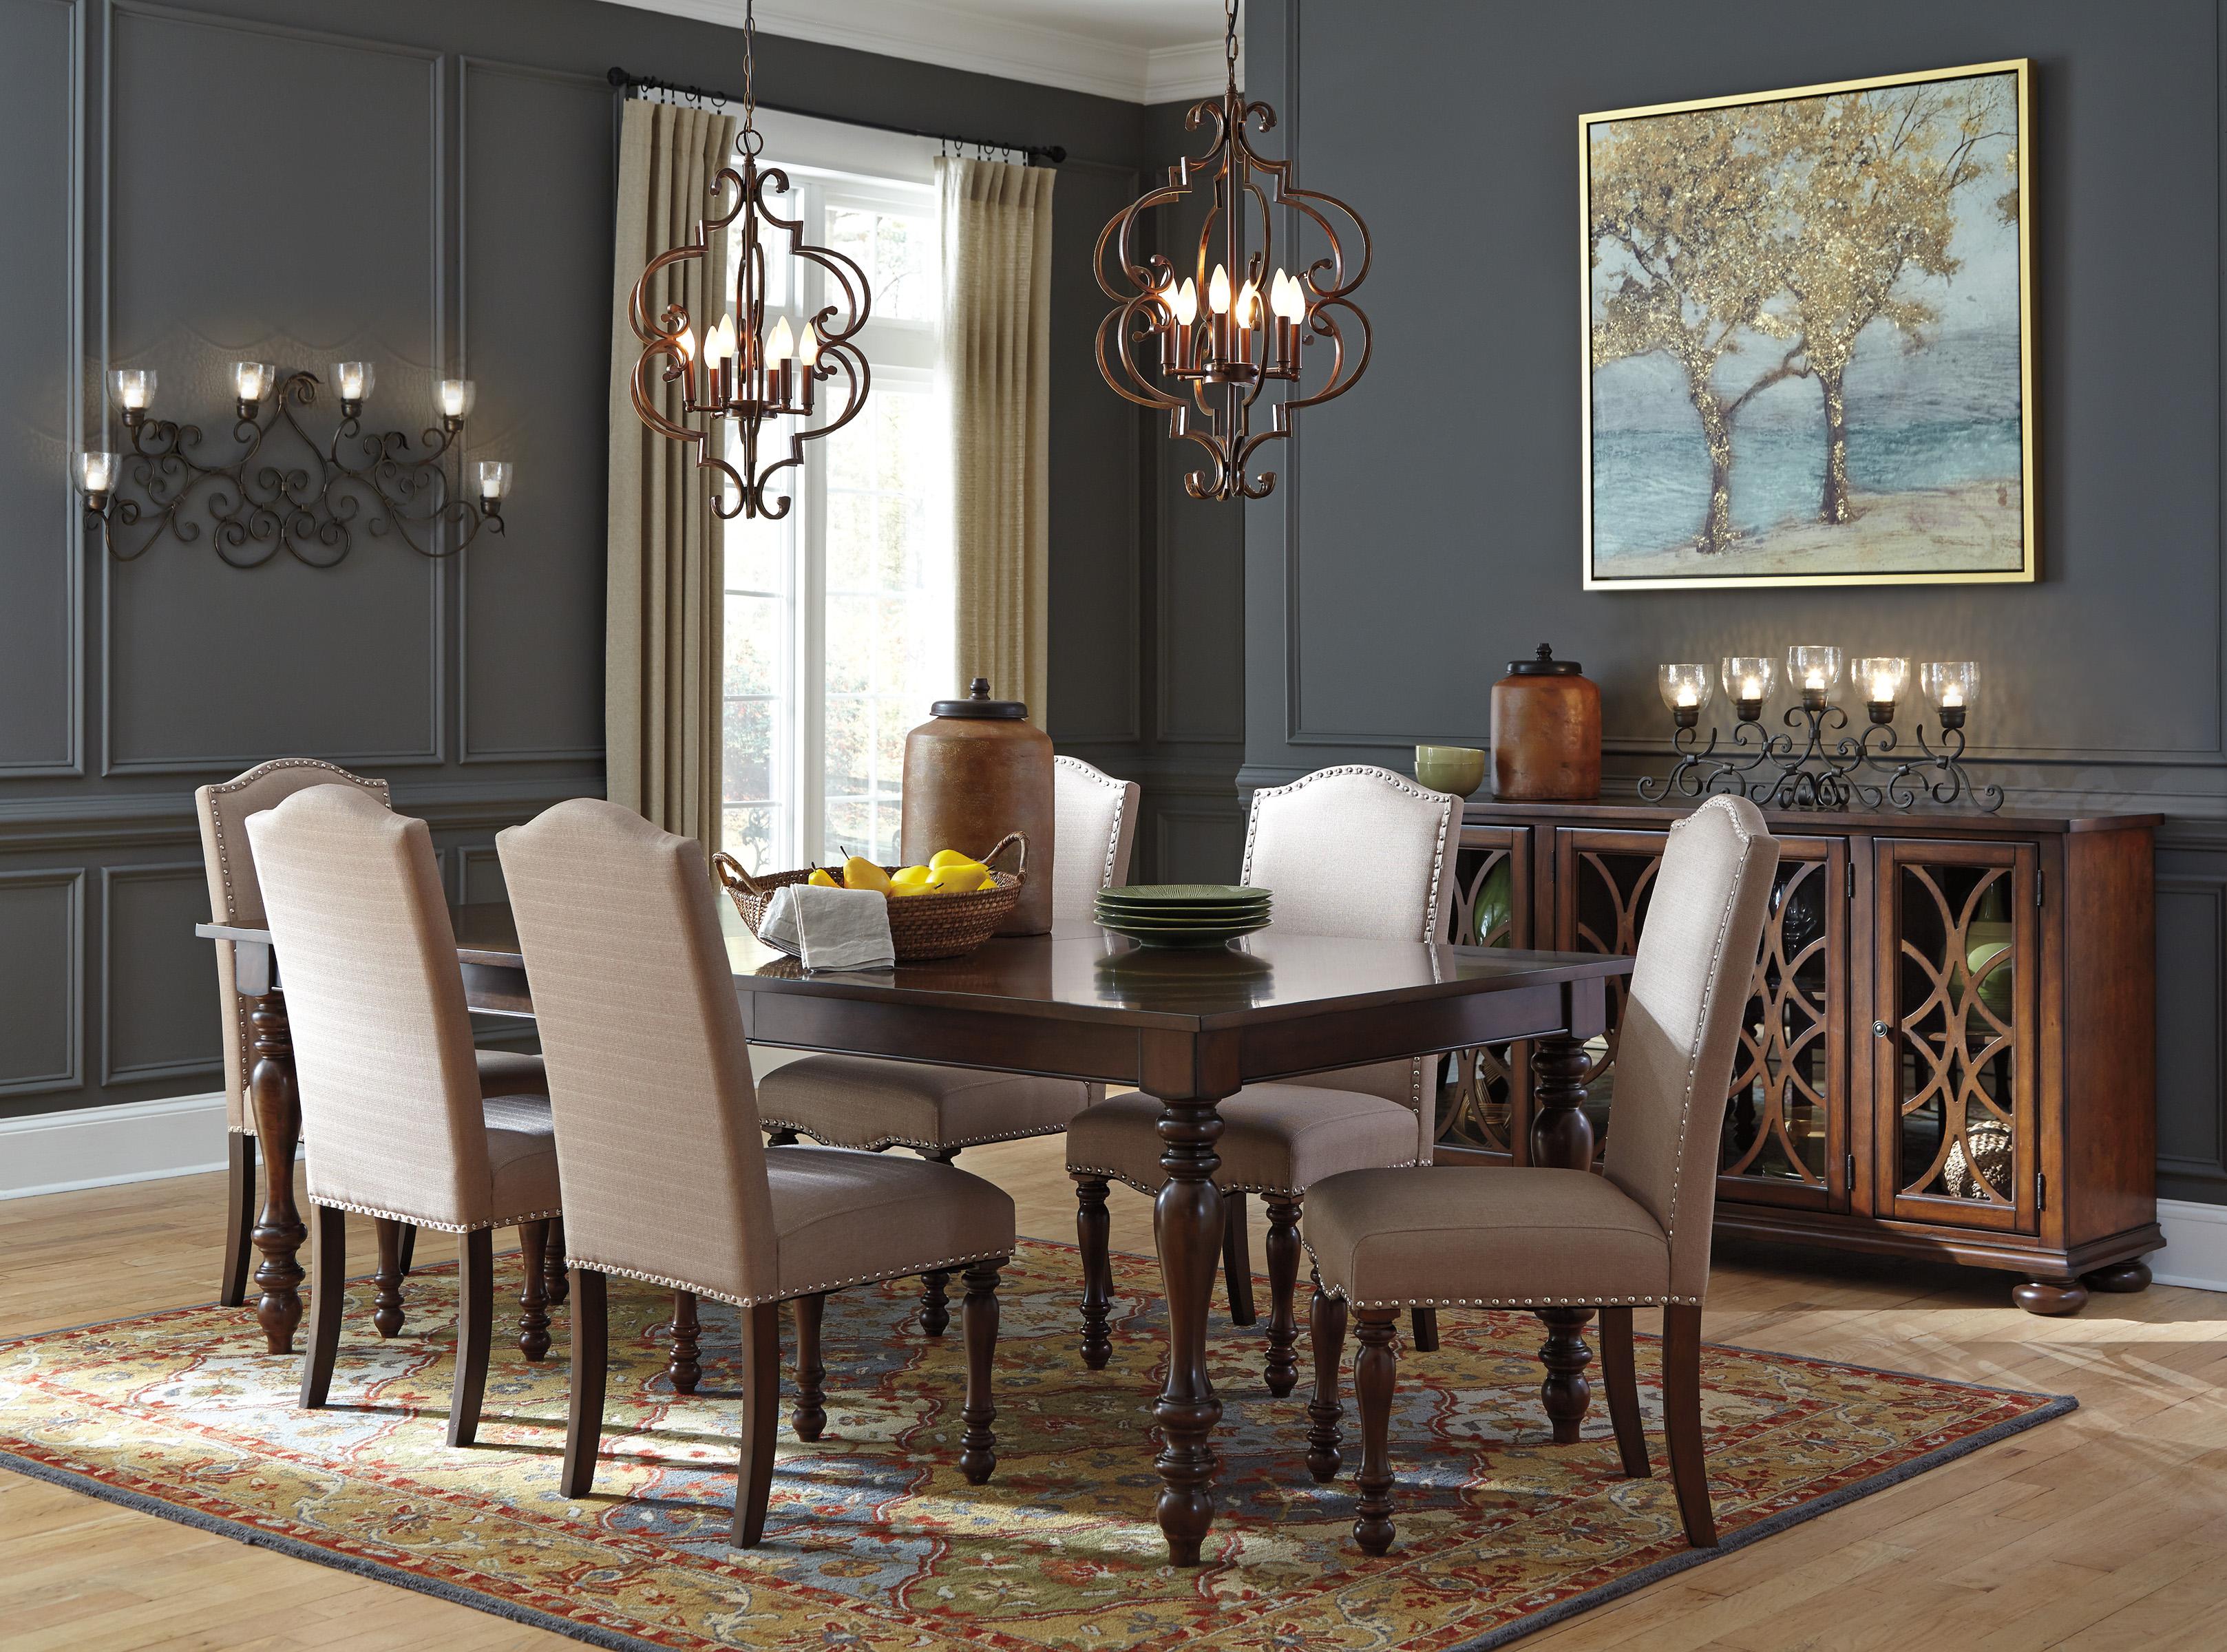 Signature Design By Ashley Baxenburg D506 Dining Table Set & Dining Table Sets for a Fall Dining Room Refresh - www ...